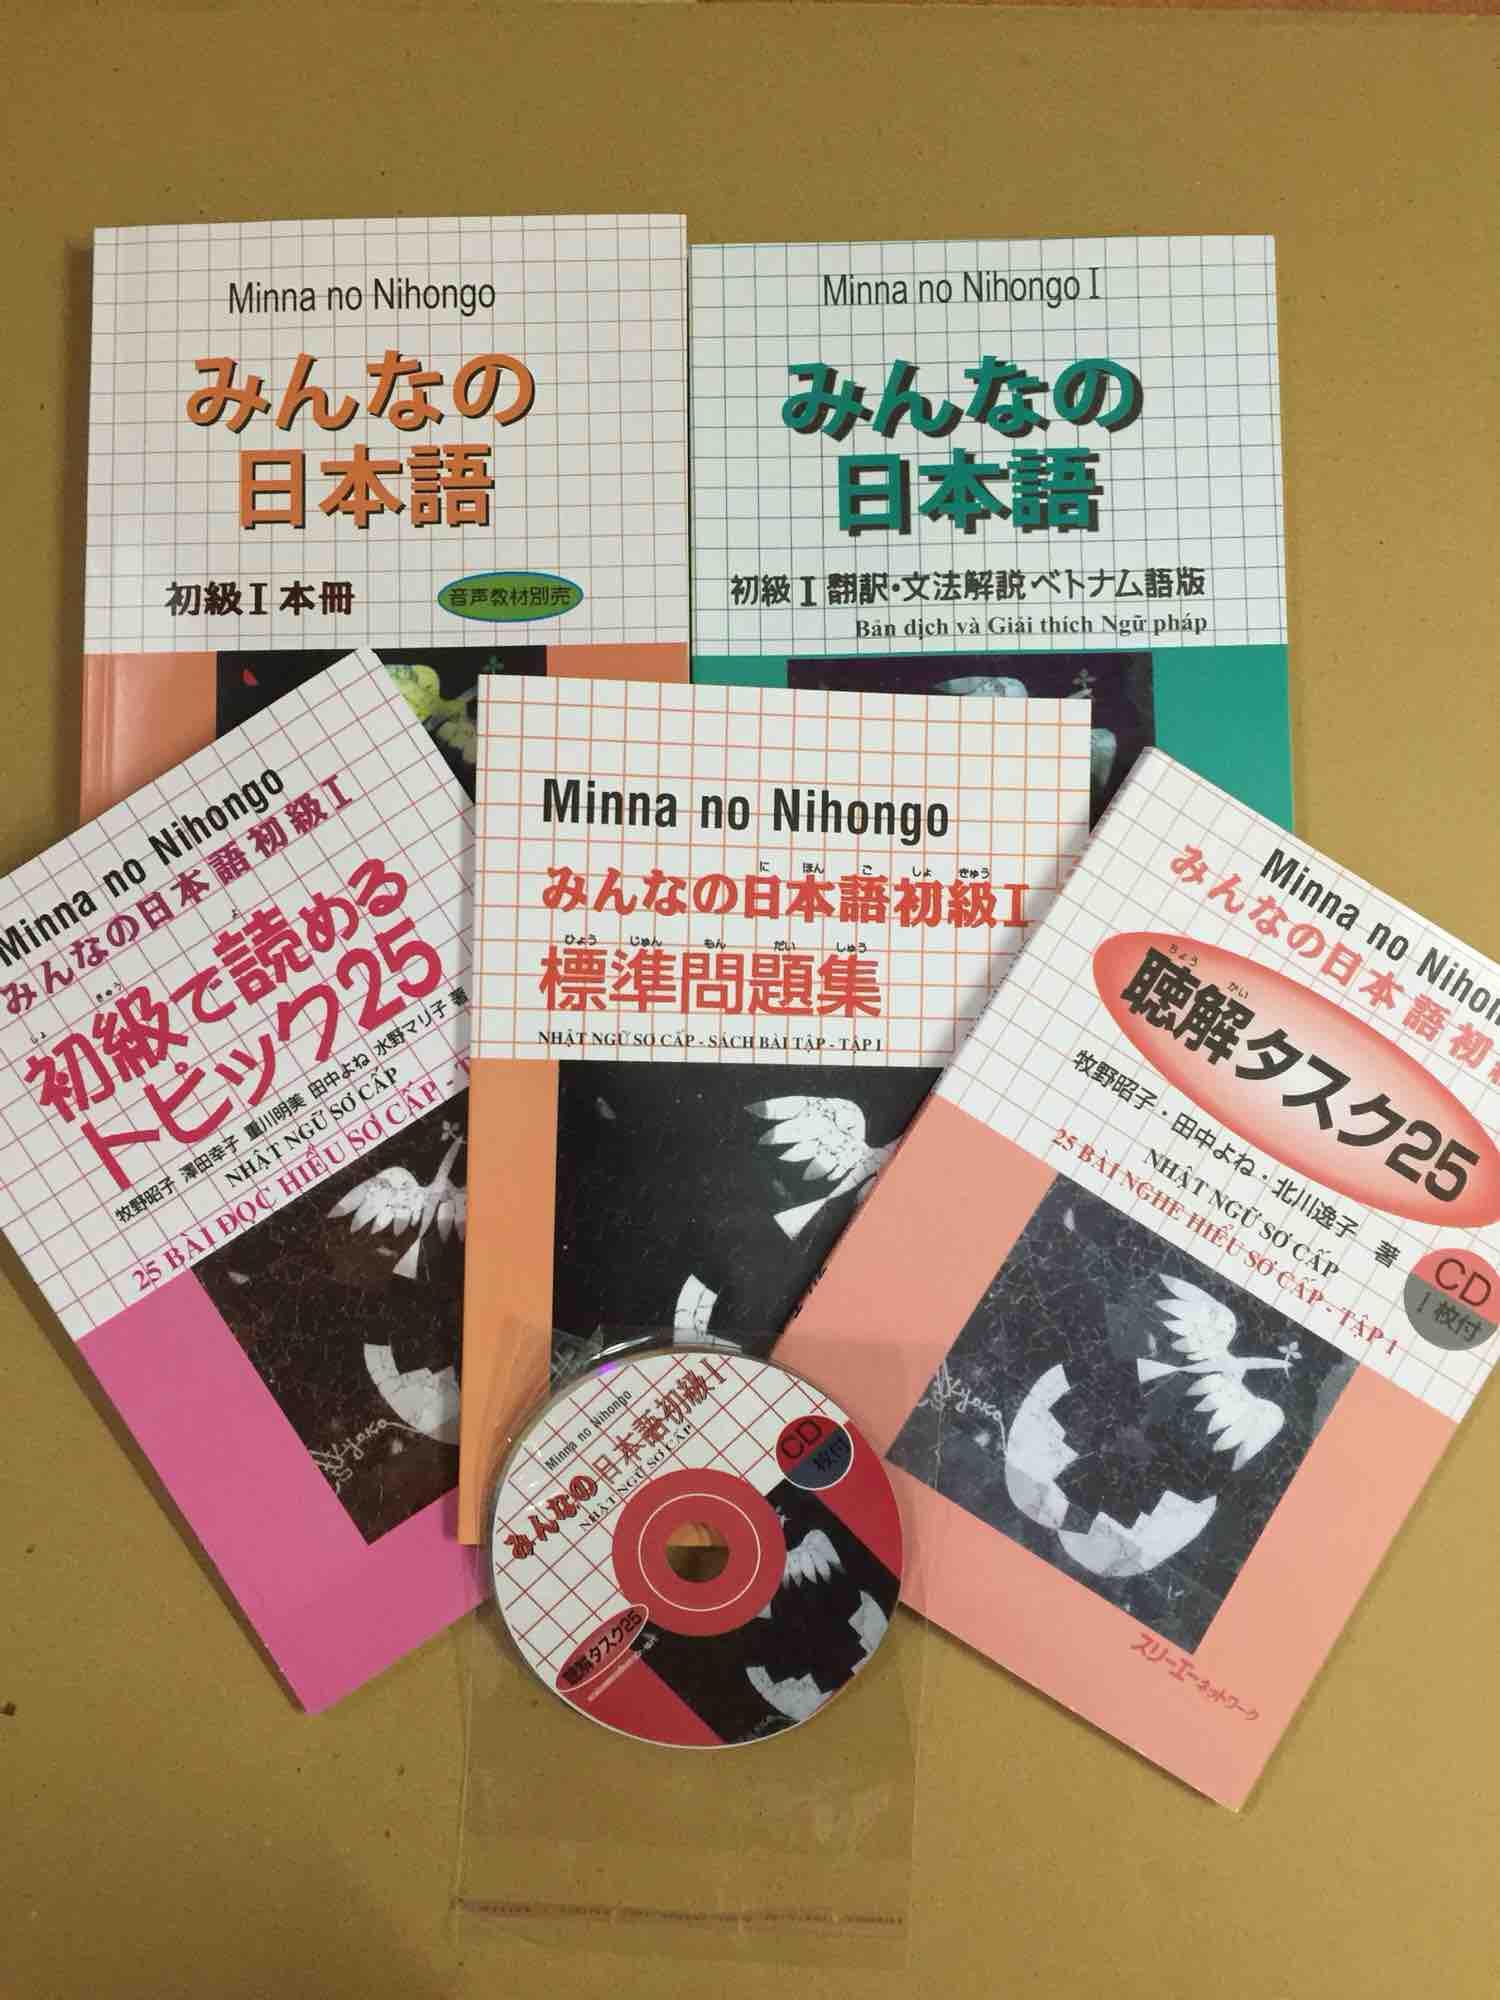 Mua Minna no nihongo tập 1 bộ 5 cuốn